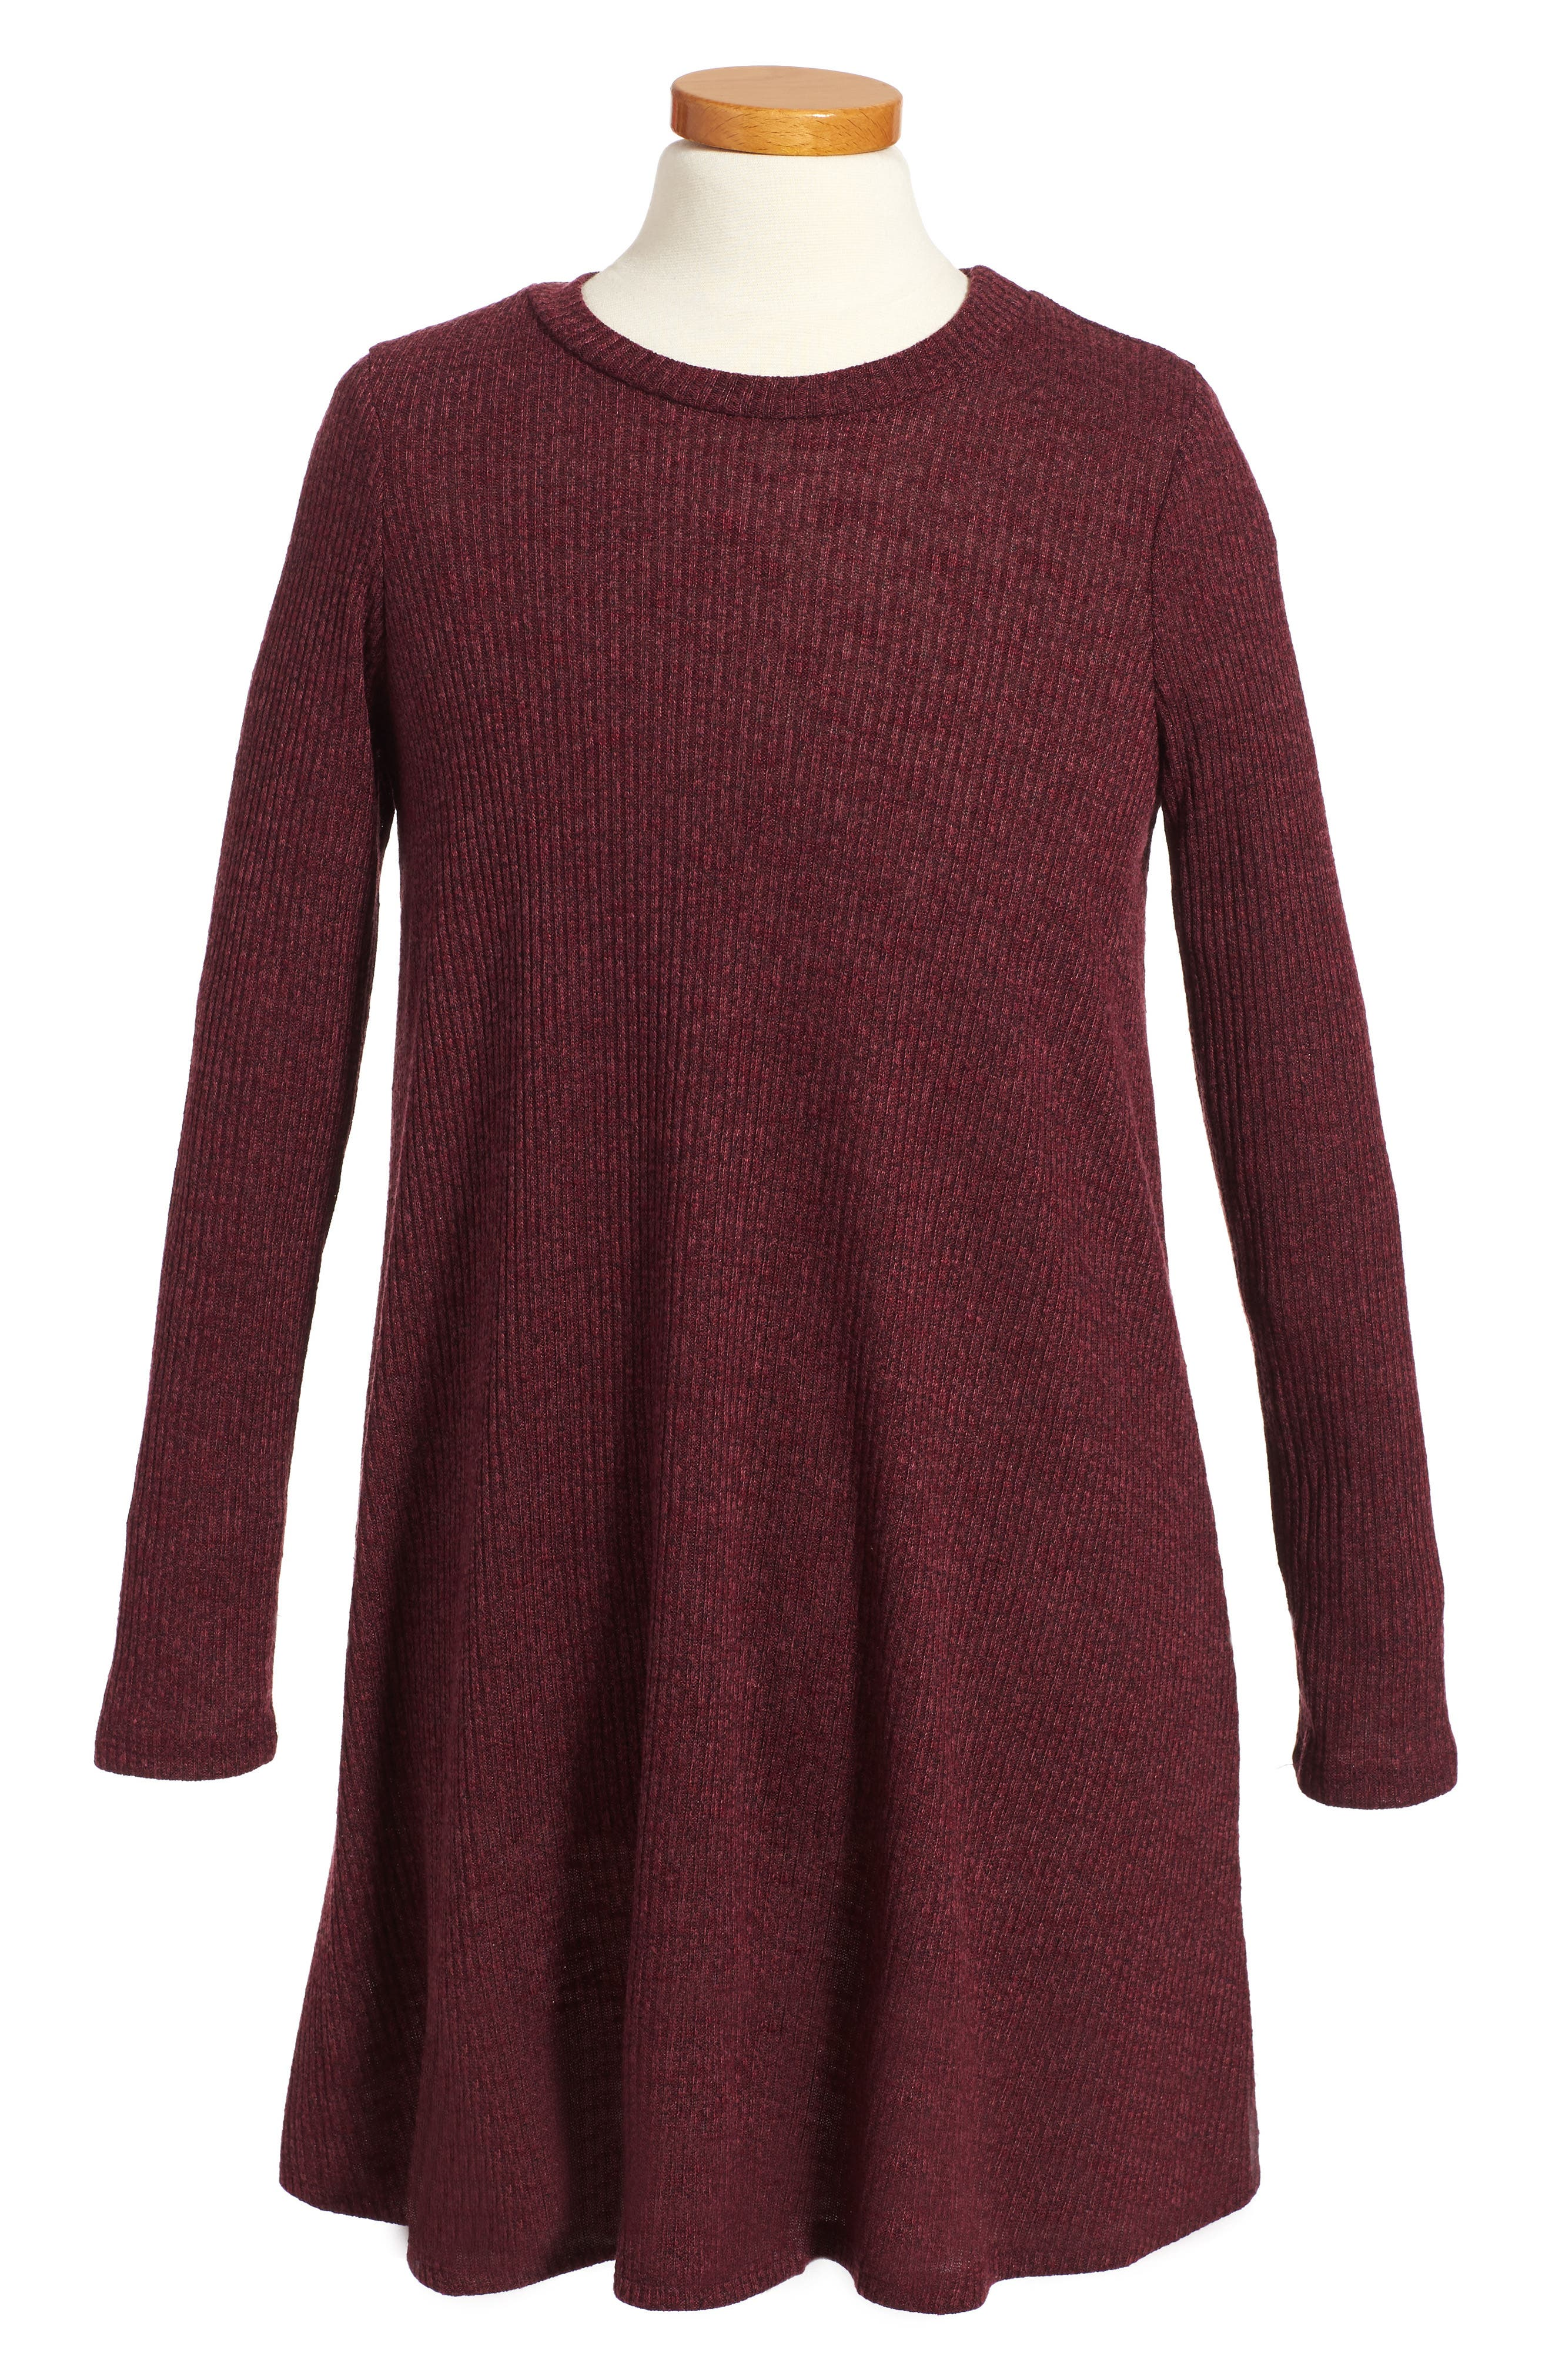 Rib Knit Sweater Dress,                         Main,                         color, 004 Wine